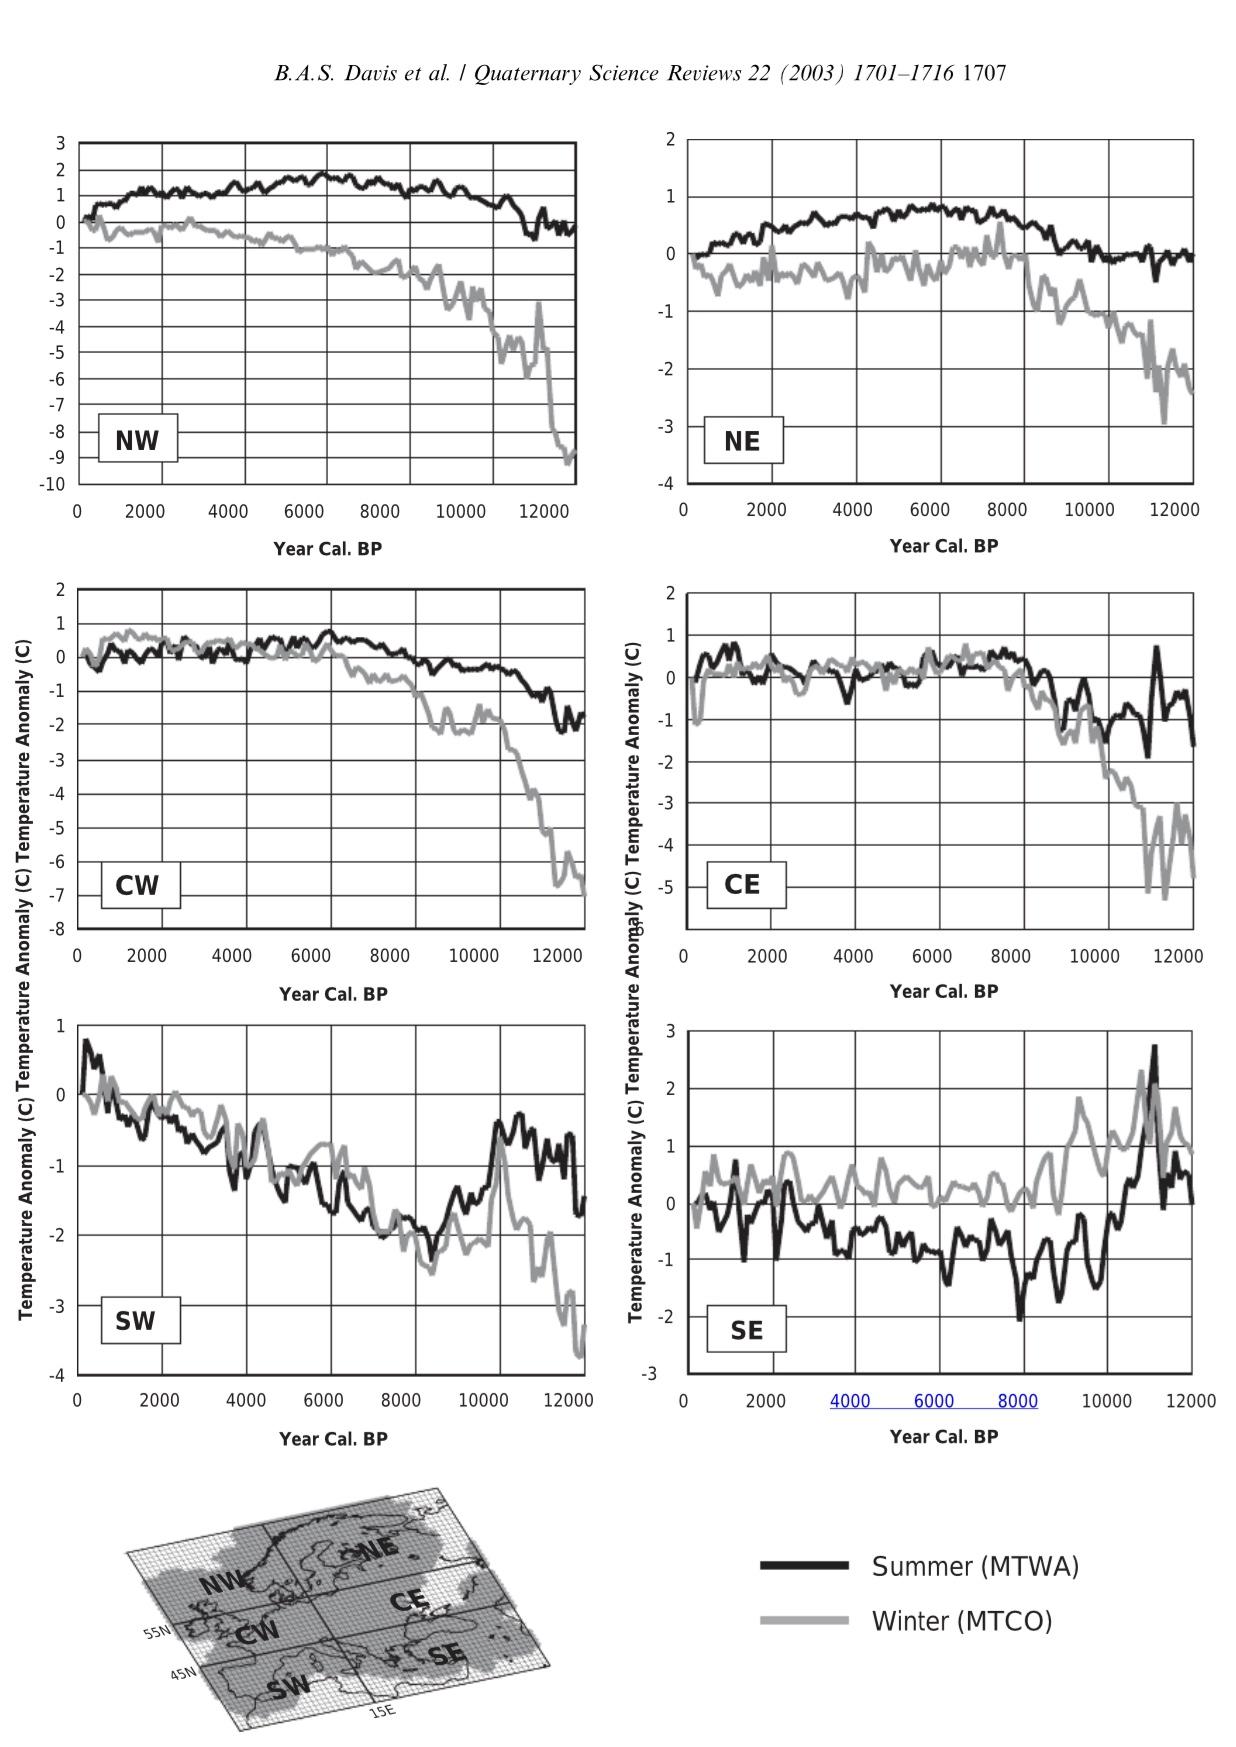 il td della paleoclimatologia-summer-and-winter-temp-anomalies-in-europe-during-holocene.jpeg